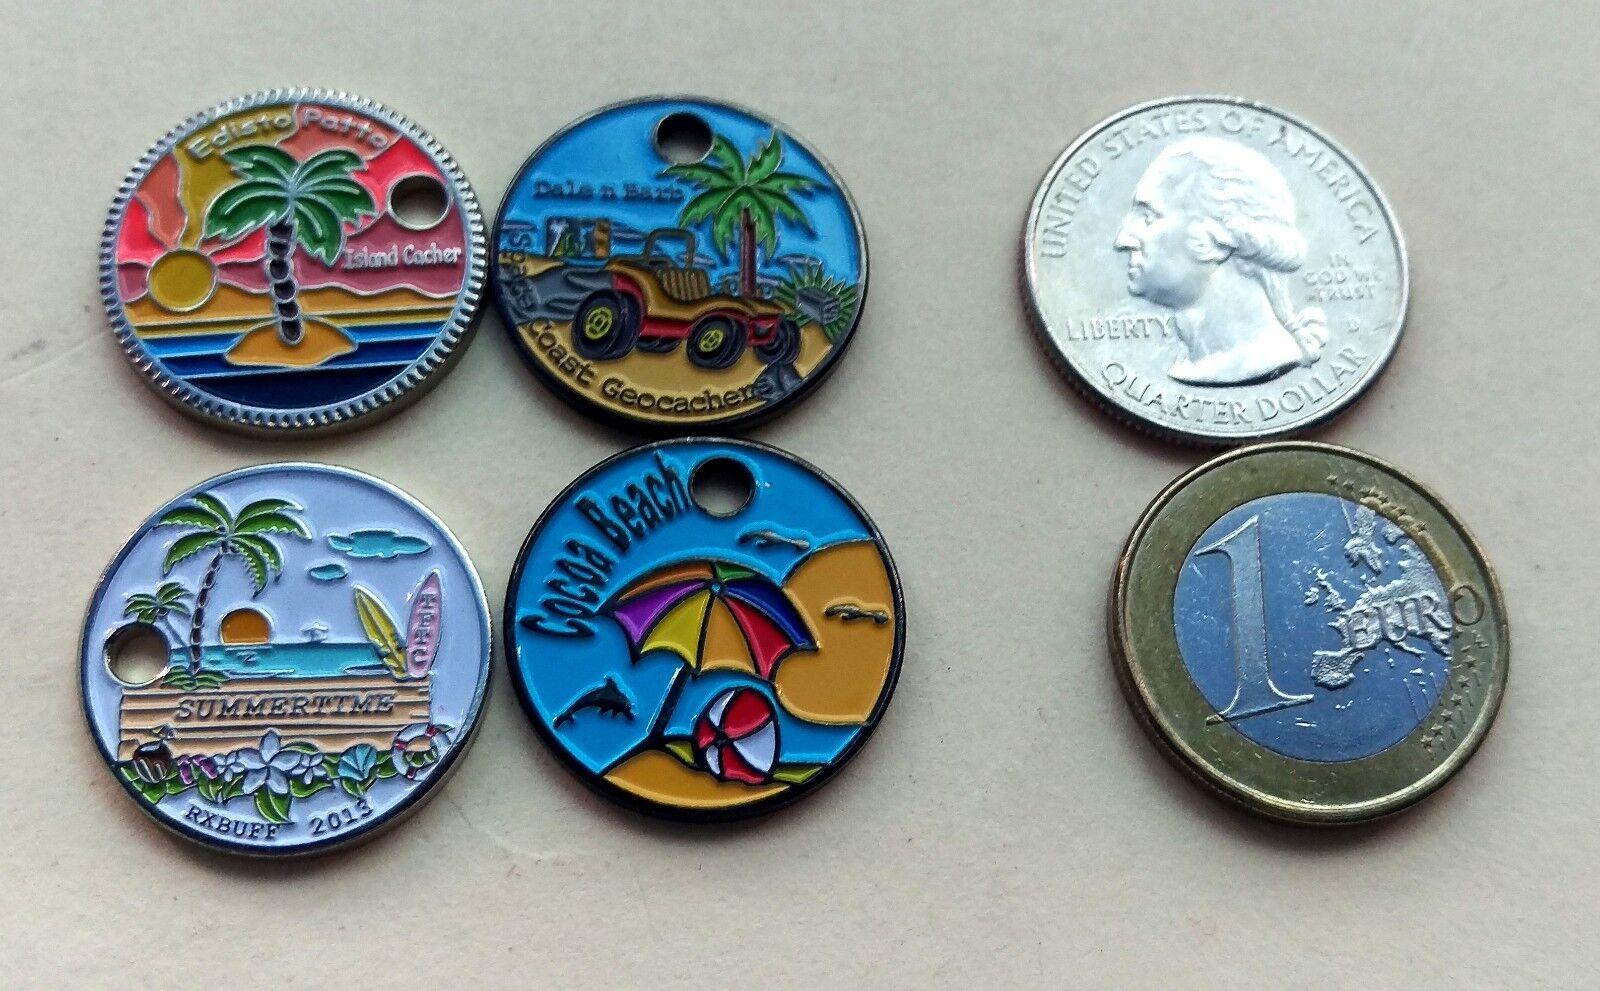 4 island / beach / palm tree themed pathtags sunset dolphin pathtag